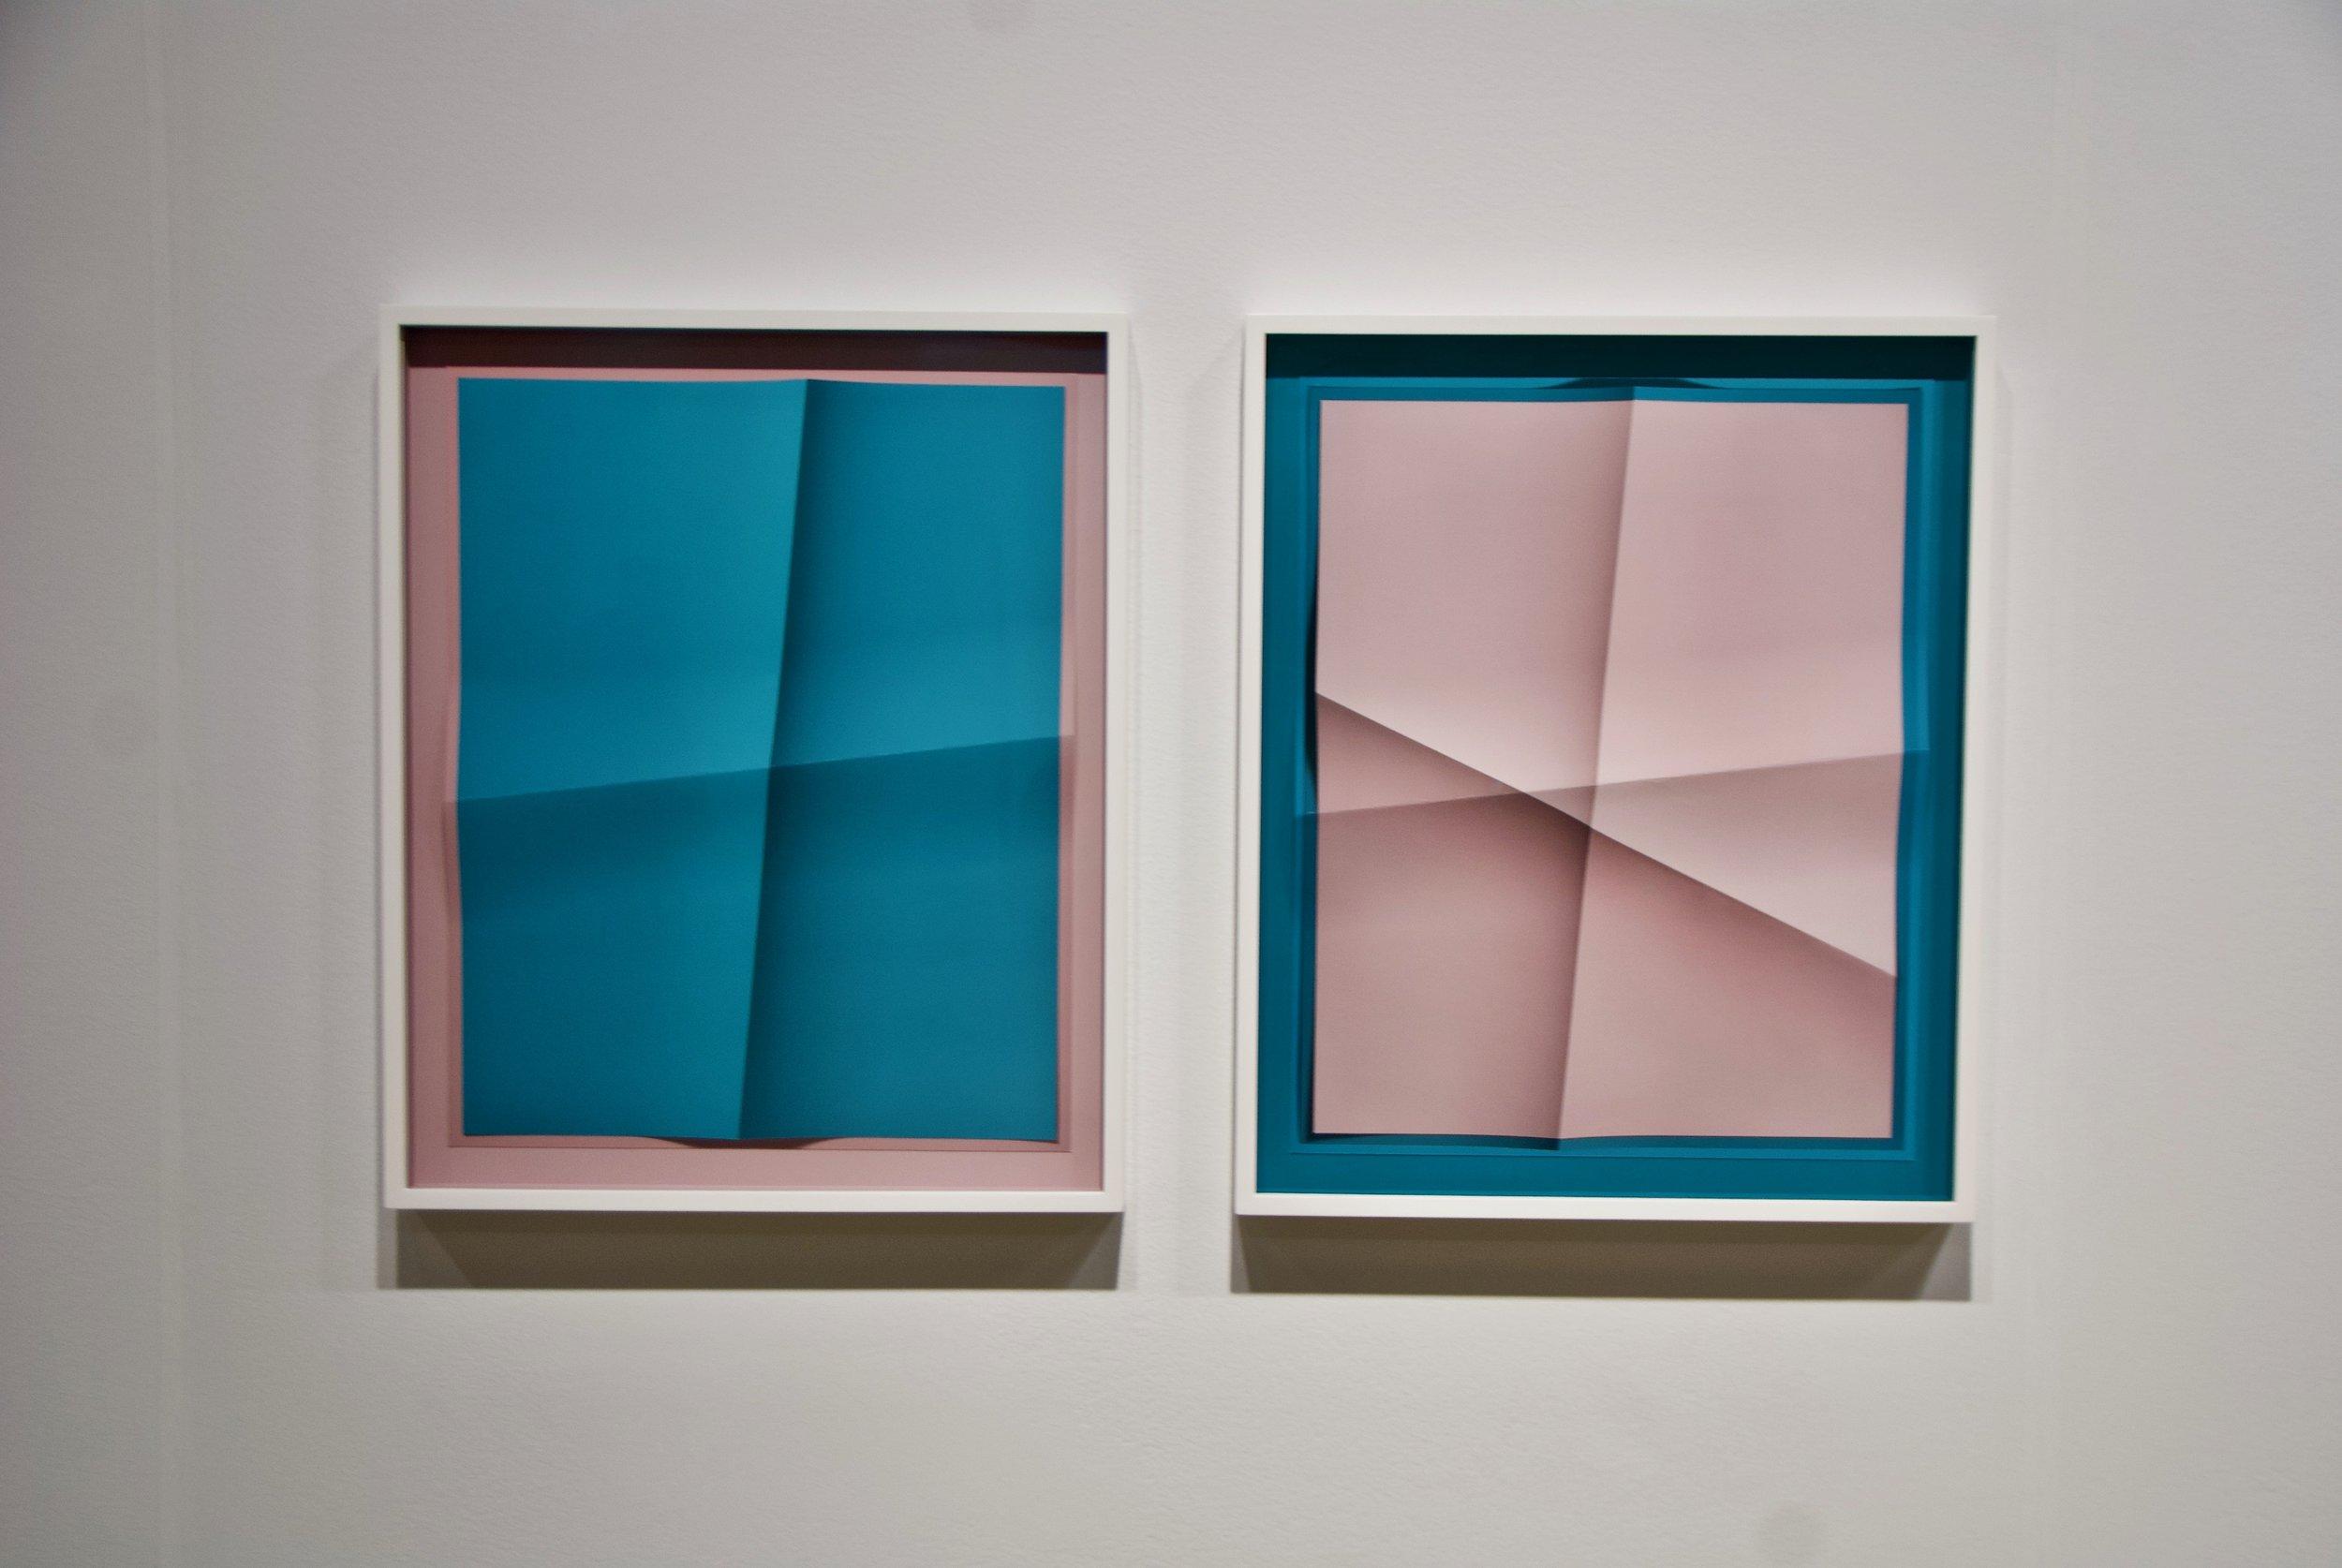 Photo of John Houck's work © Ruben Natal-San Miguel